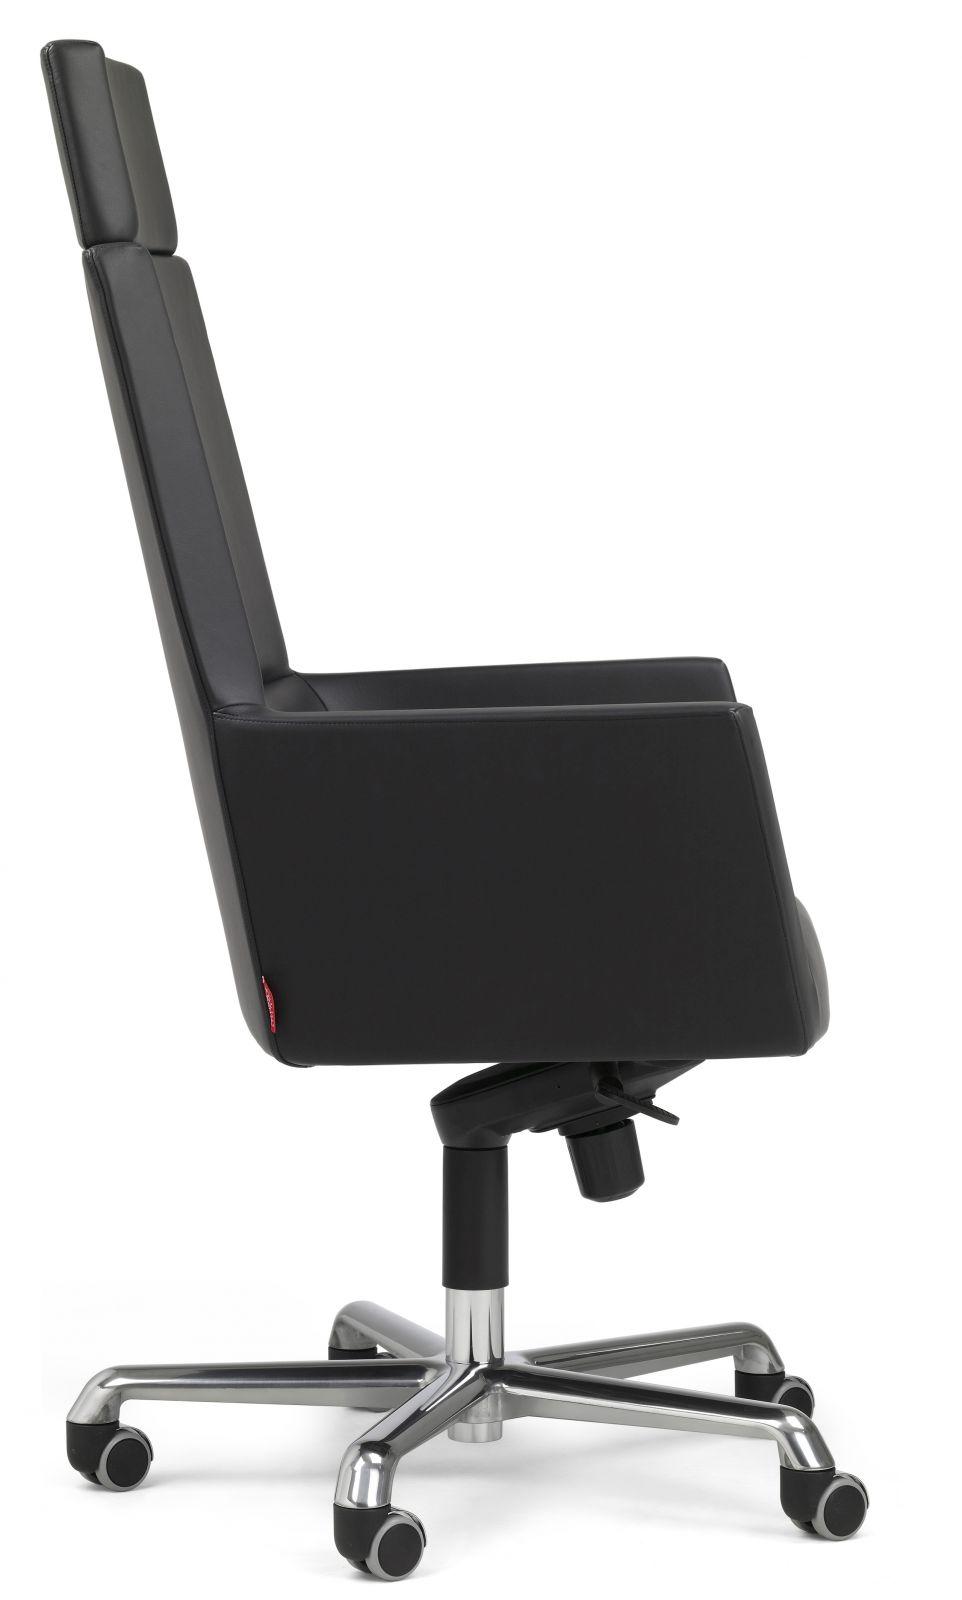 modern-office-chairs-Italian-furniture-designer-chairs (1).jpg